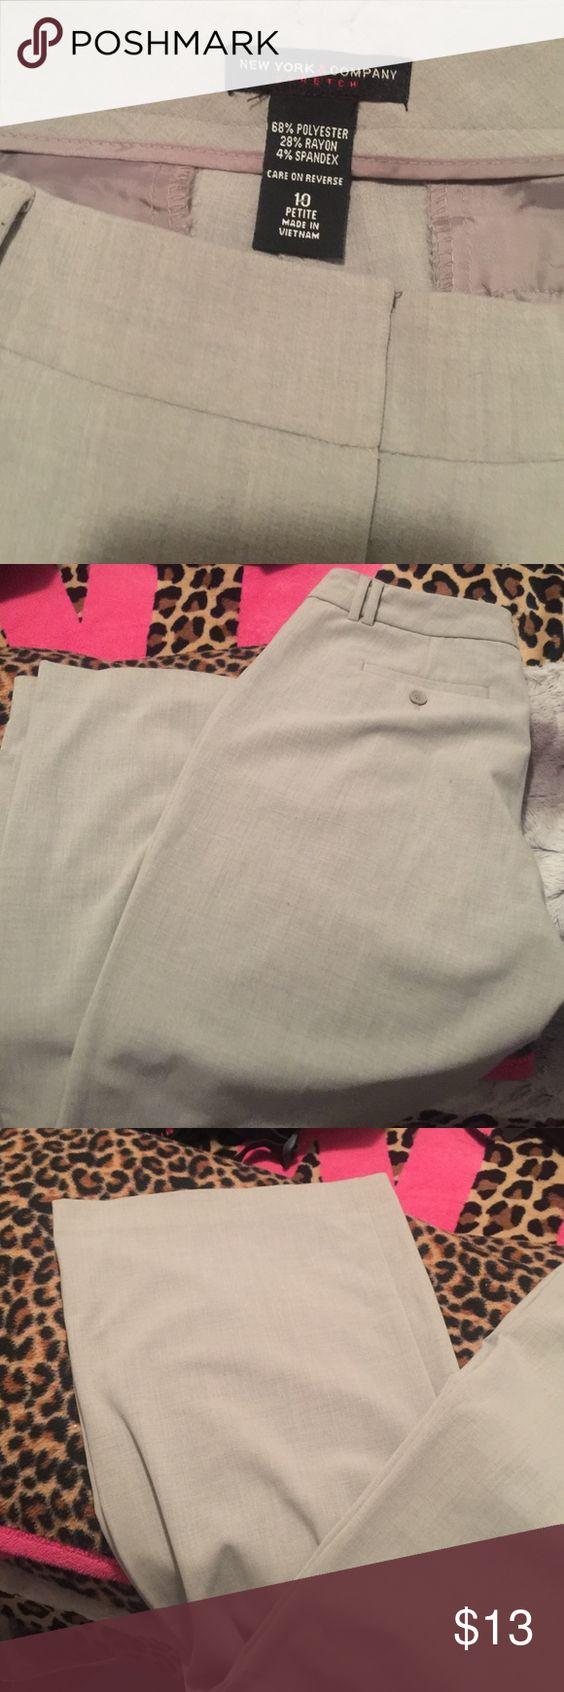 New York & Company Dress Pants Size 10 Petite New York & Company Dress Pants , Like New , Color is like a light beige / grey New York & Company Pants